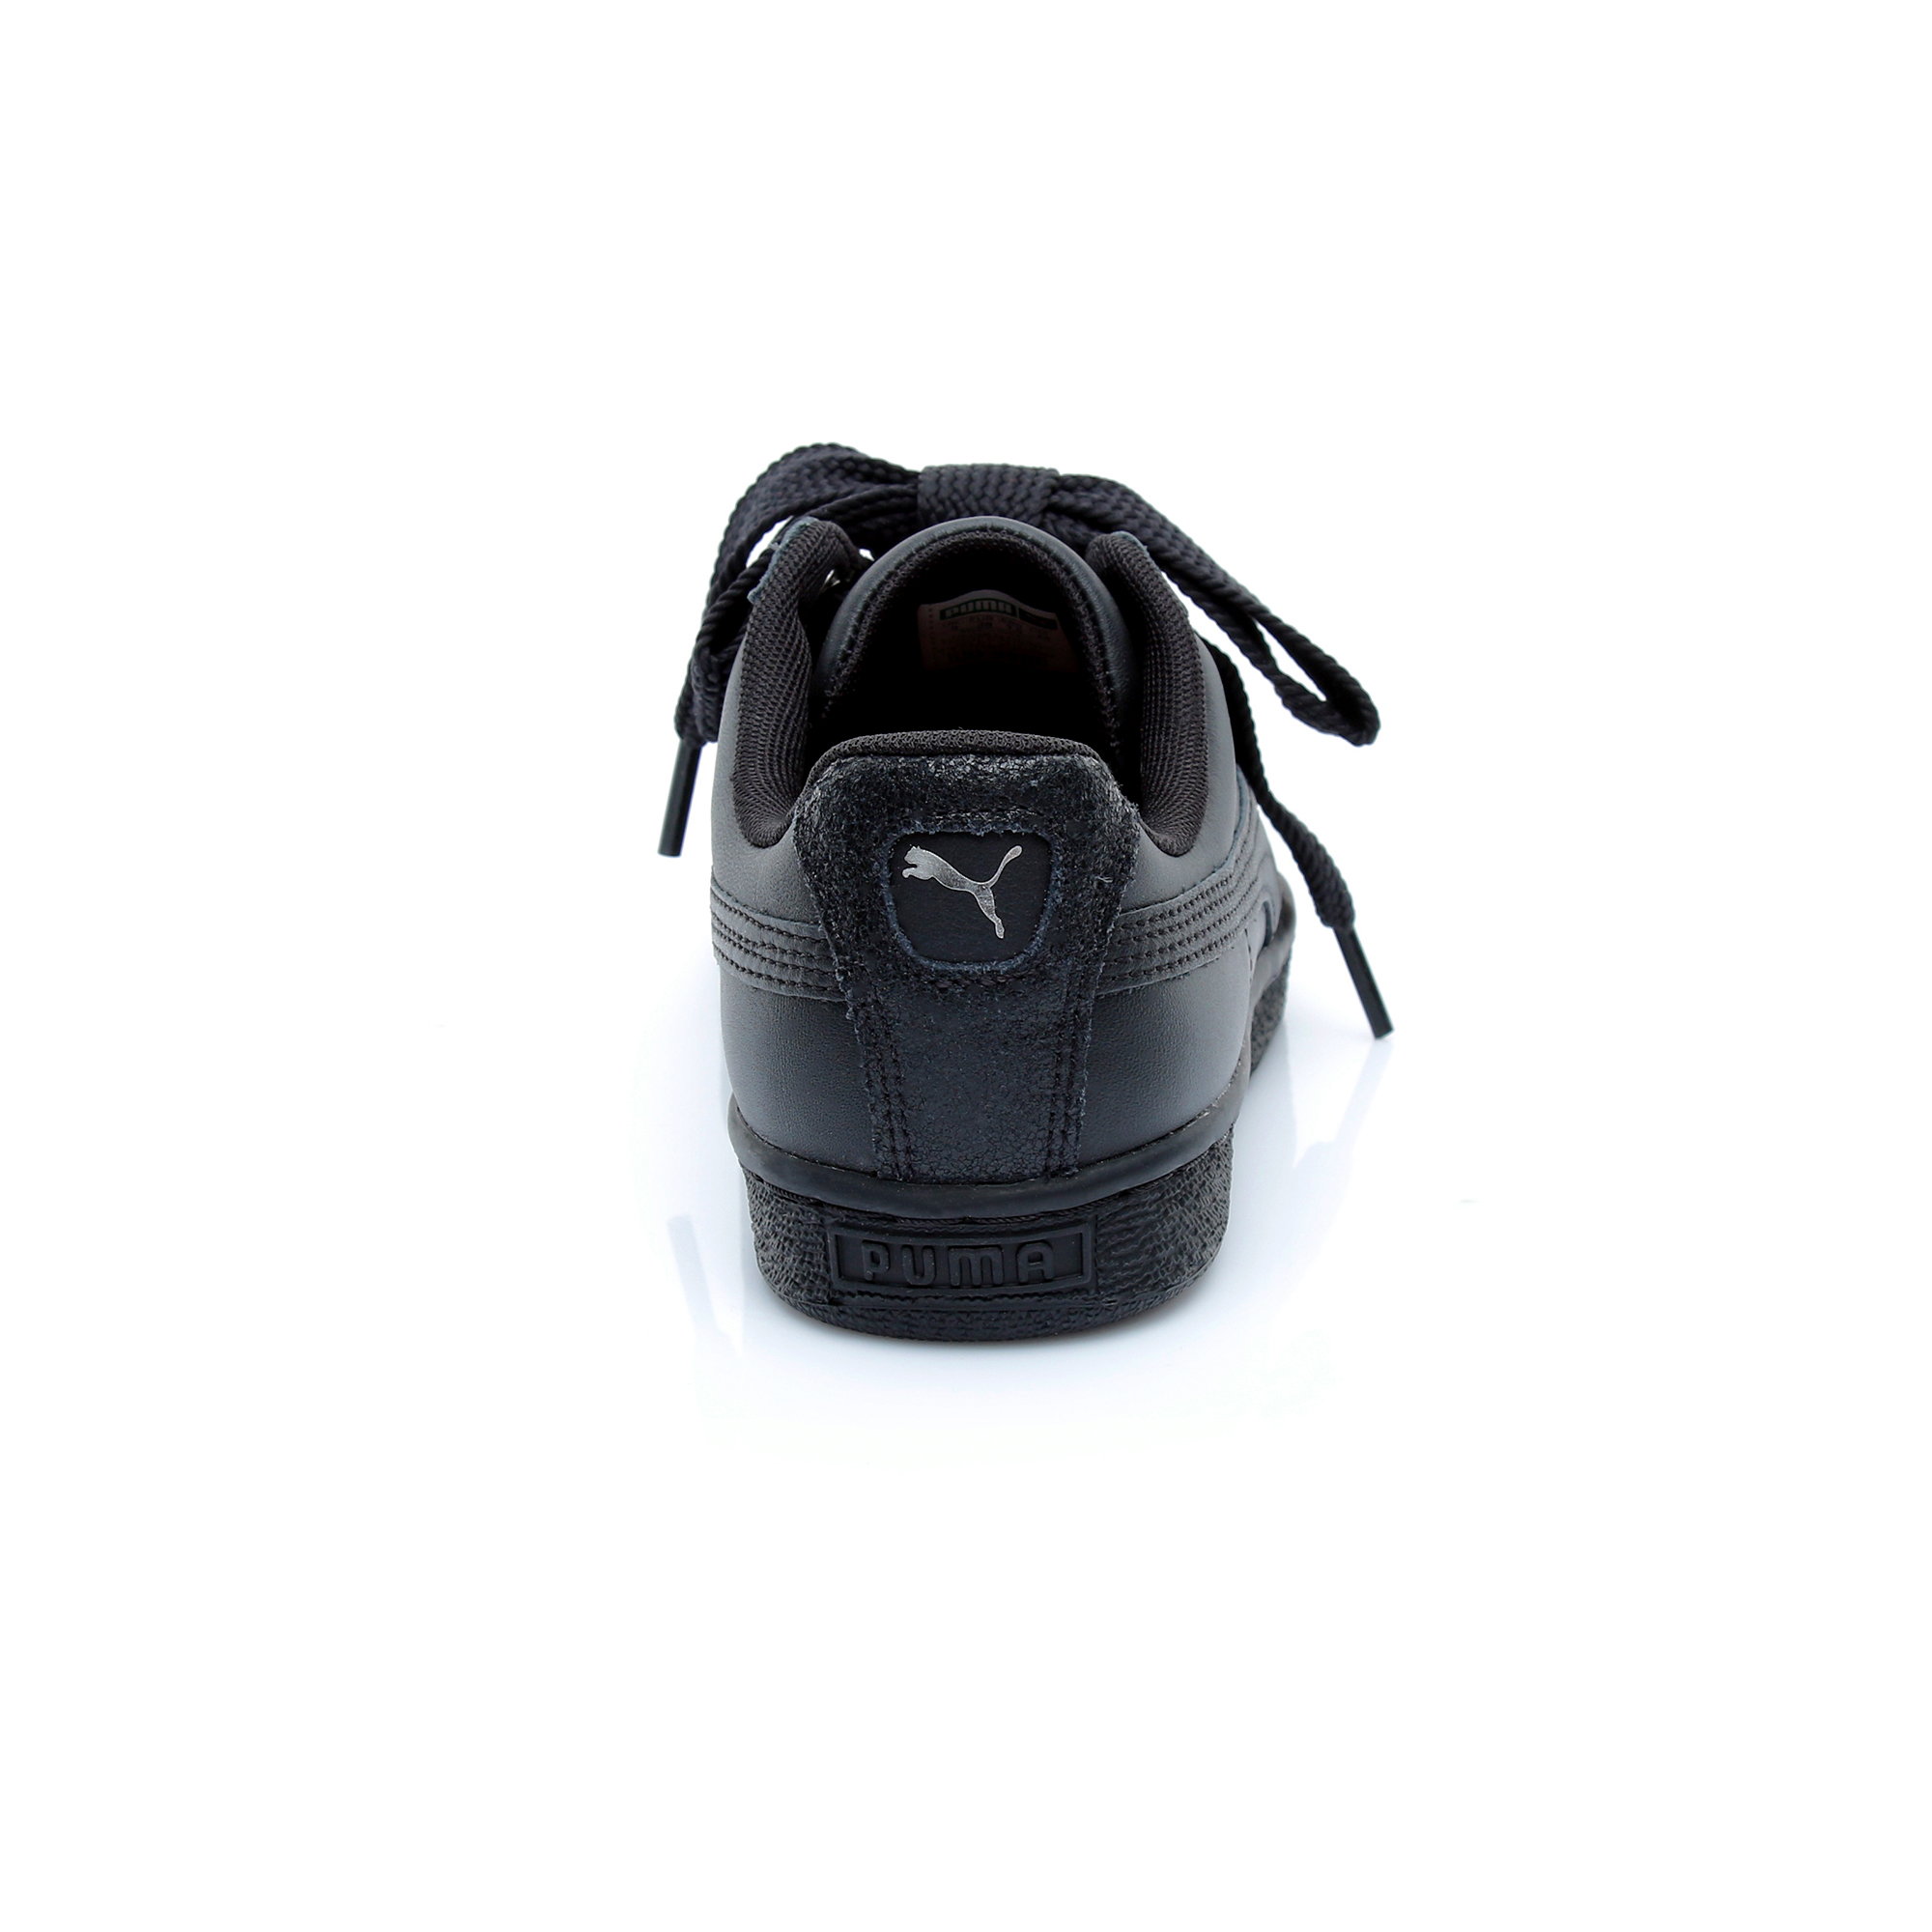 Puma Basket Heart Bio Hacking Kadın Siyah Spor Ayakkabı